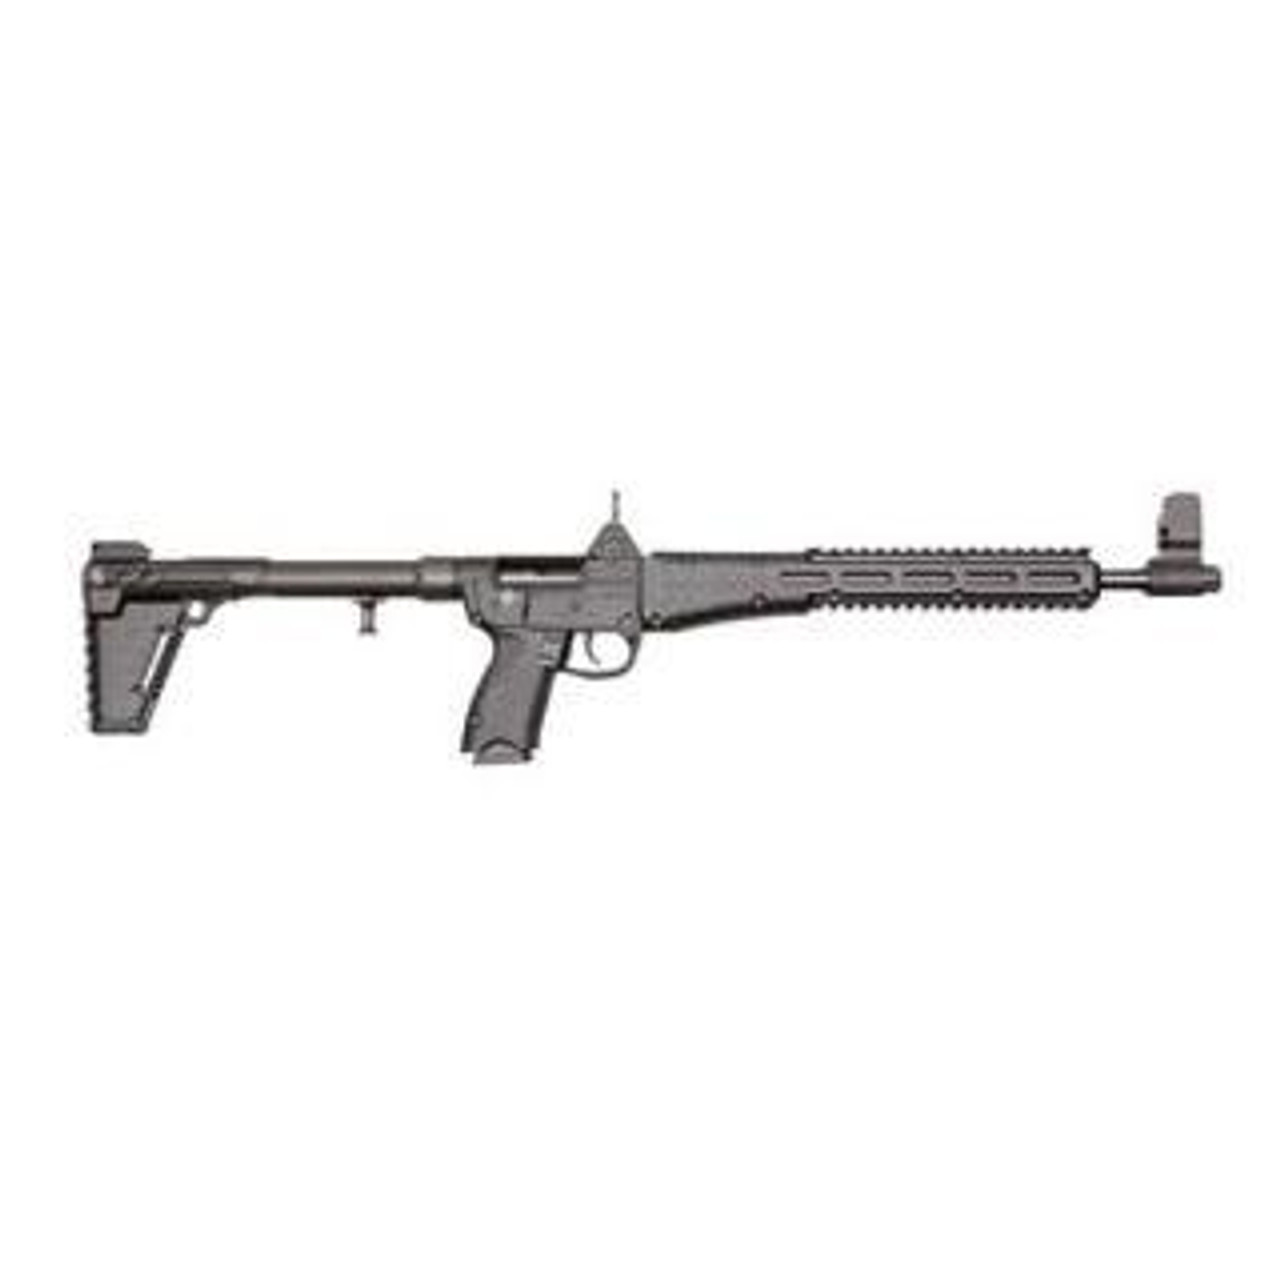 Kel Tec Sub2000 Gen2(GLOCK 17) CALIFORNIA LEGAL- 9mm